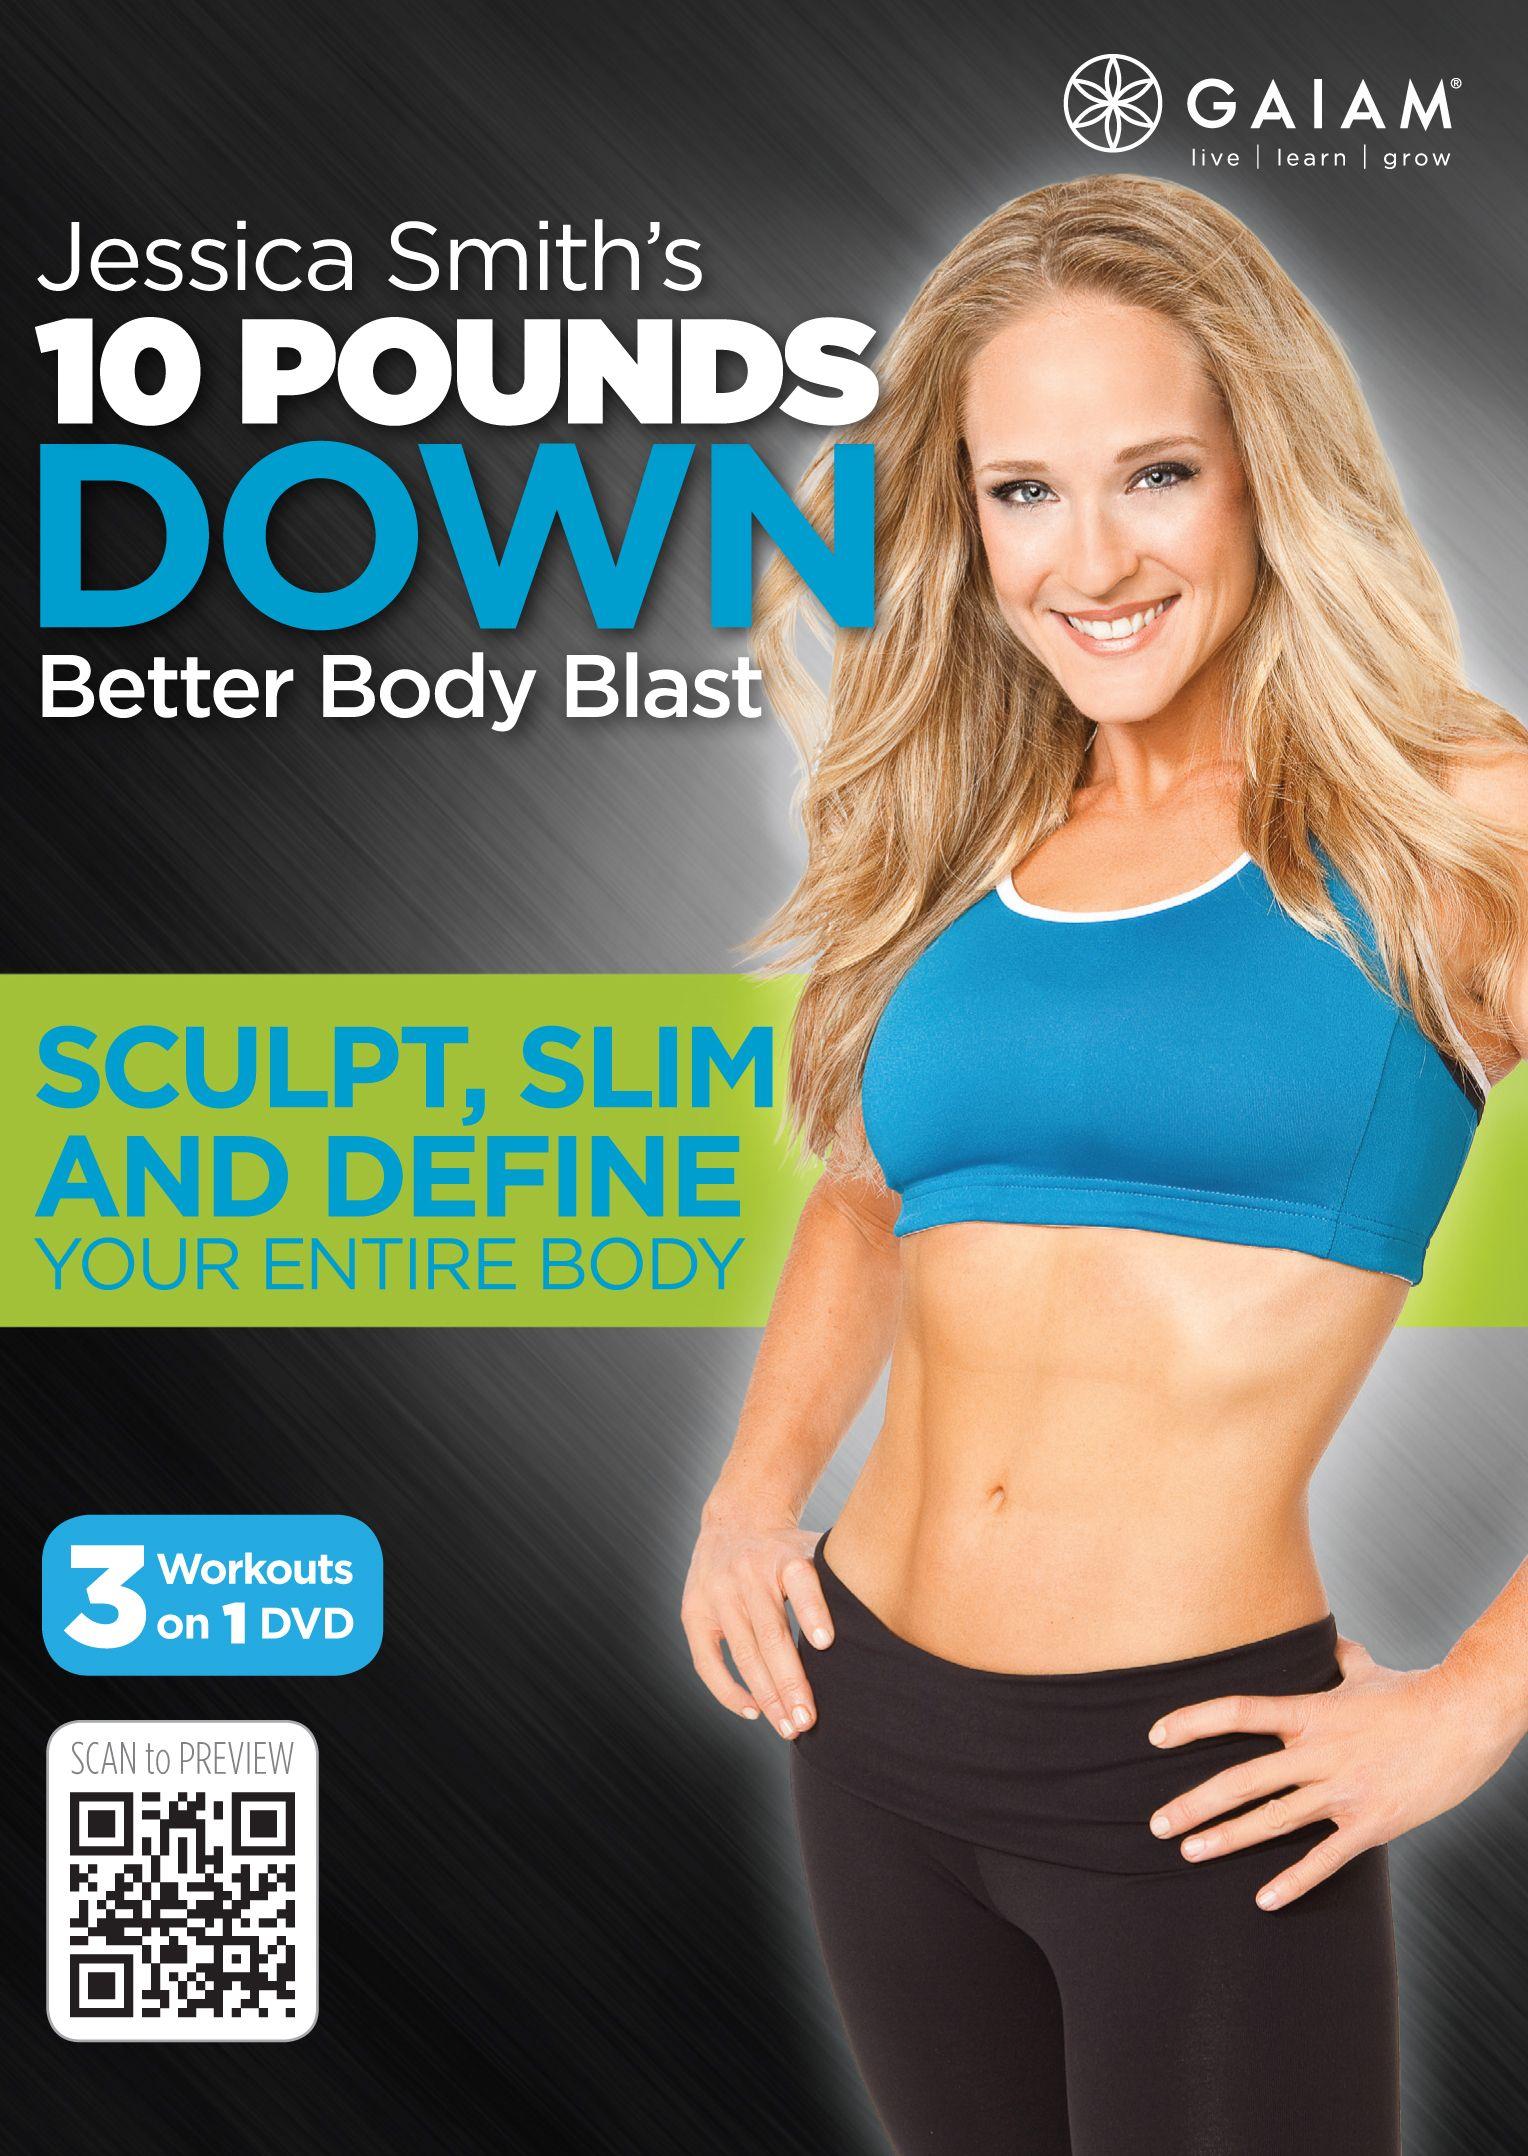 Jessica Smith's 10 Pounds Down Better Body Blast